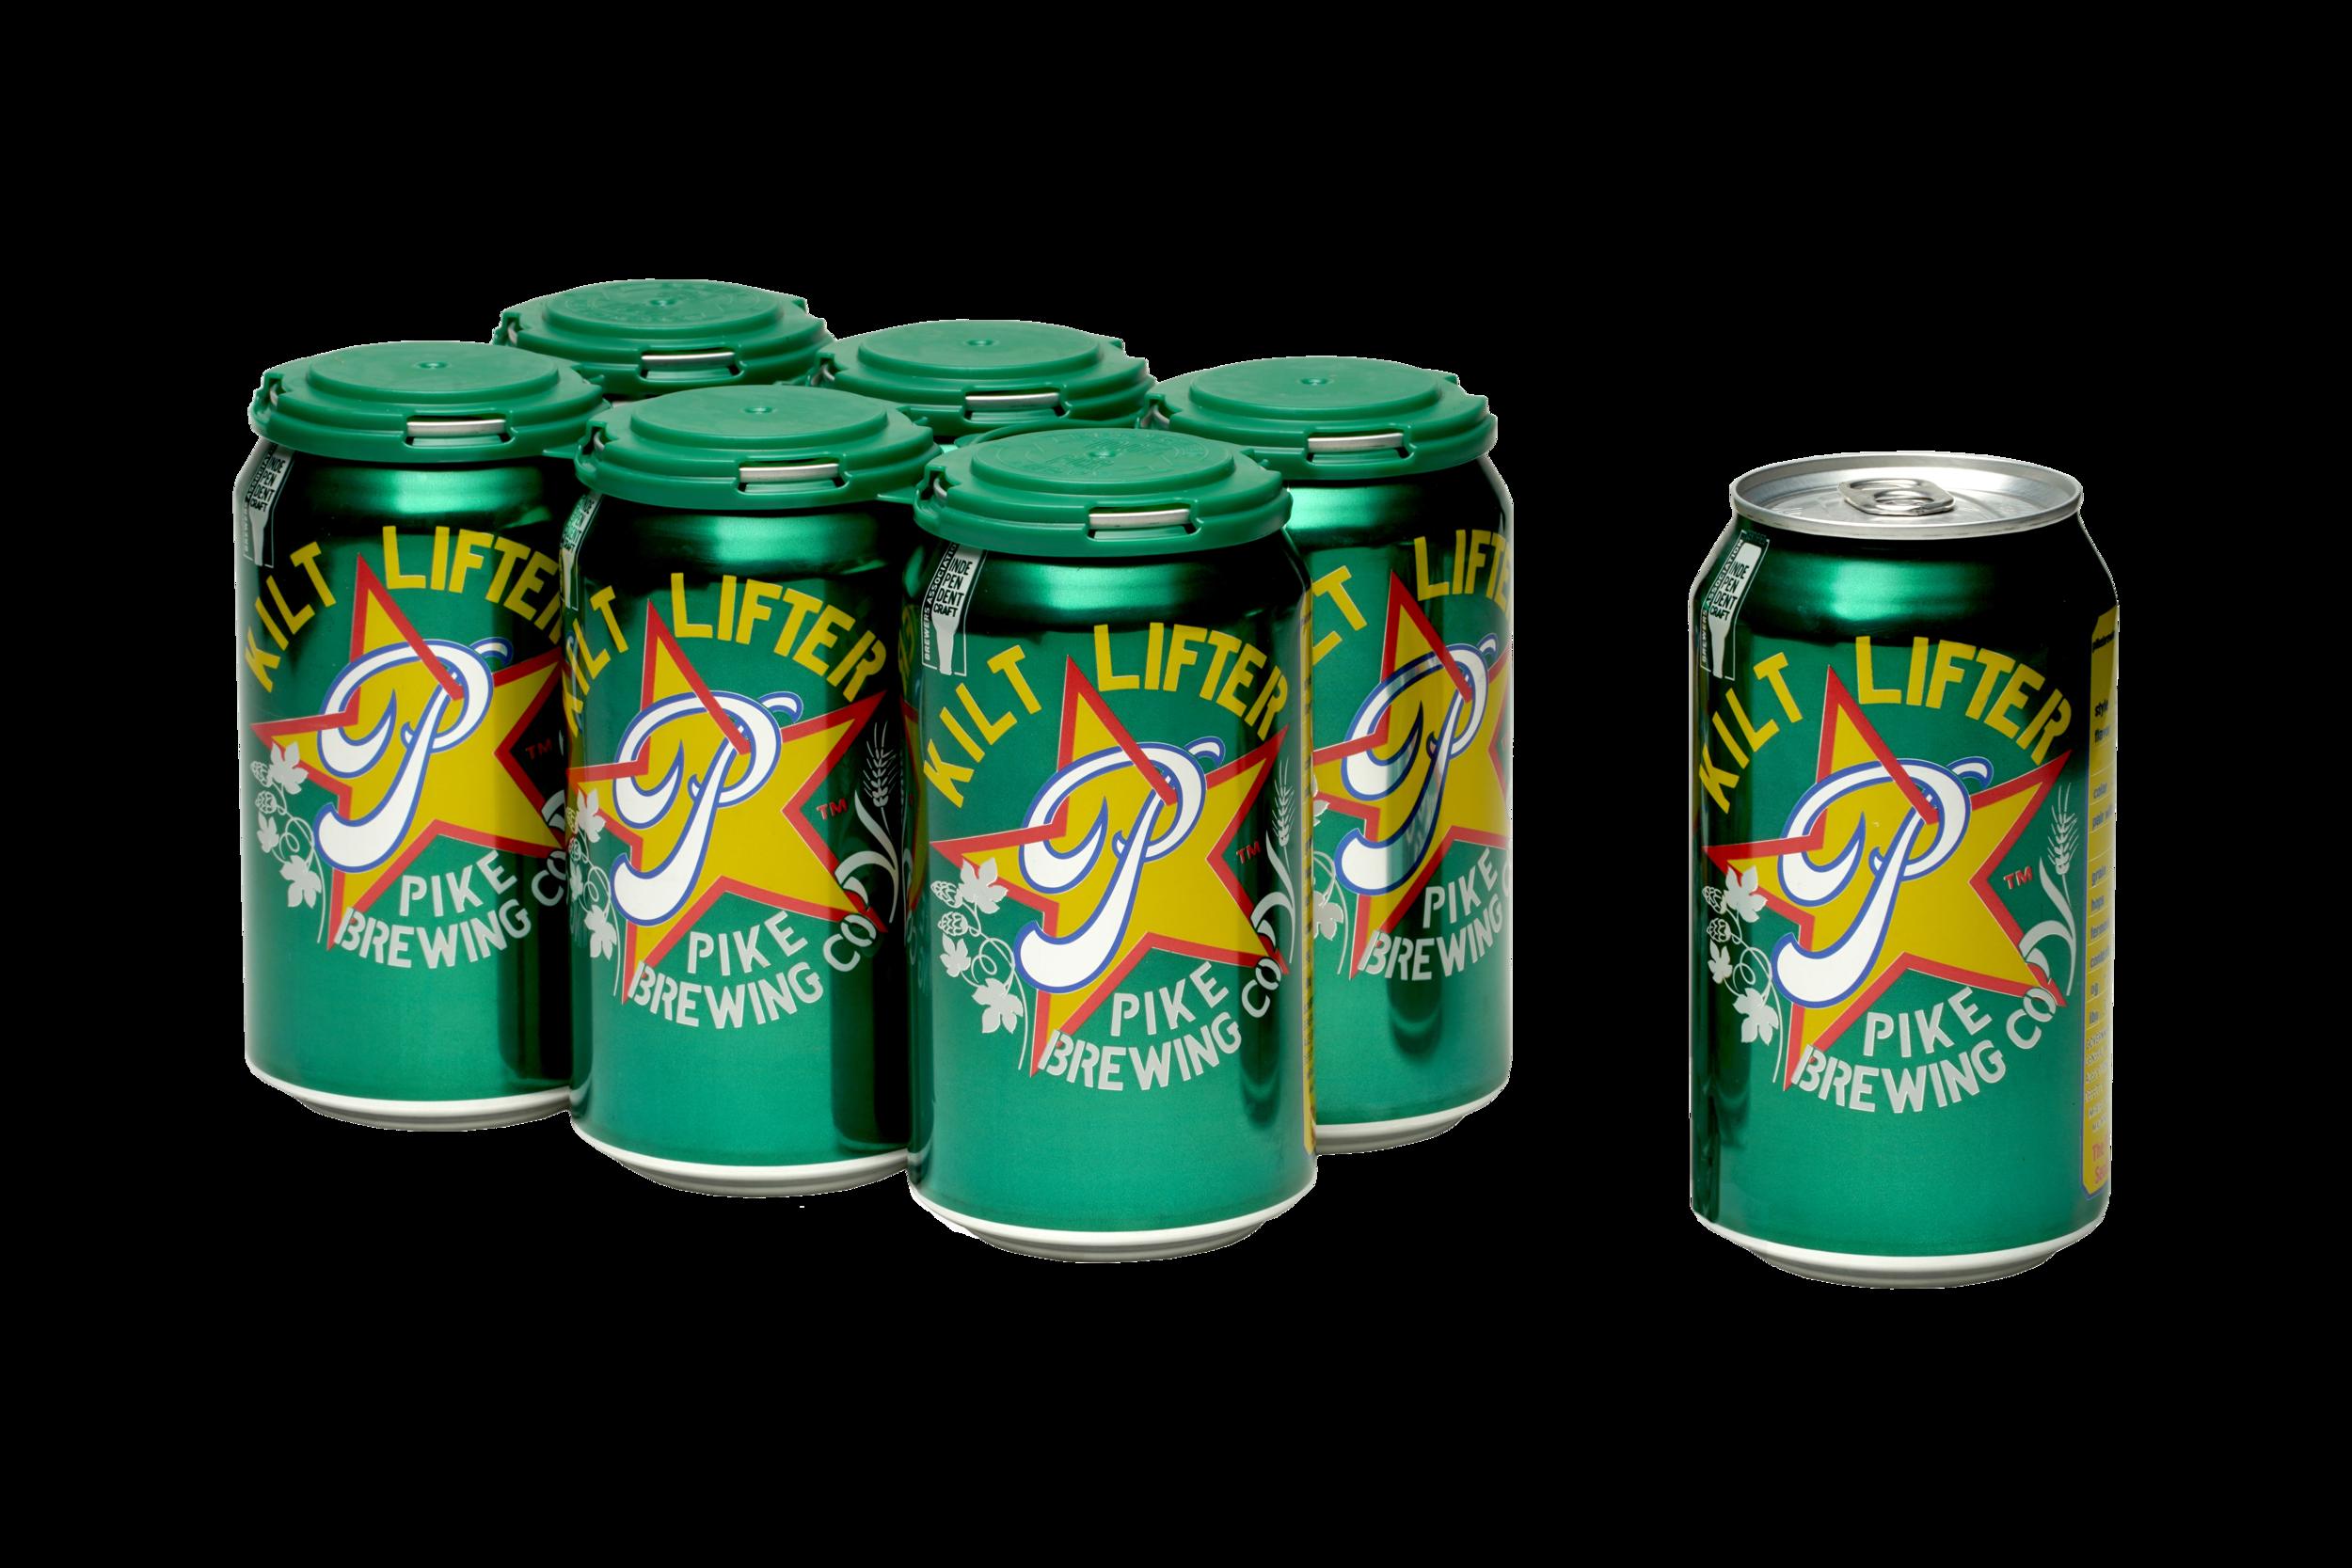 Pike Kilt Lifter cans